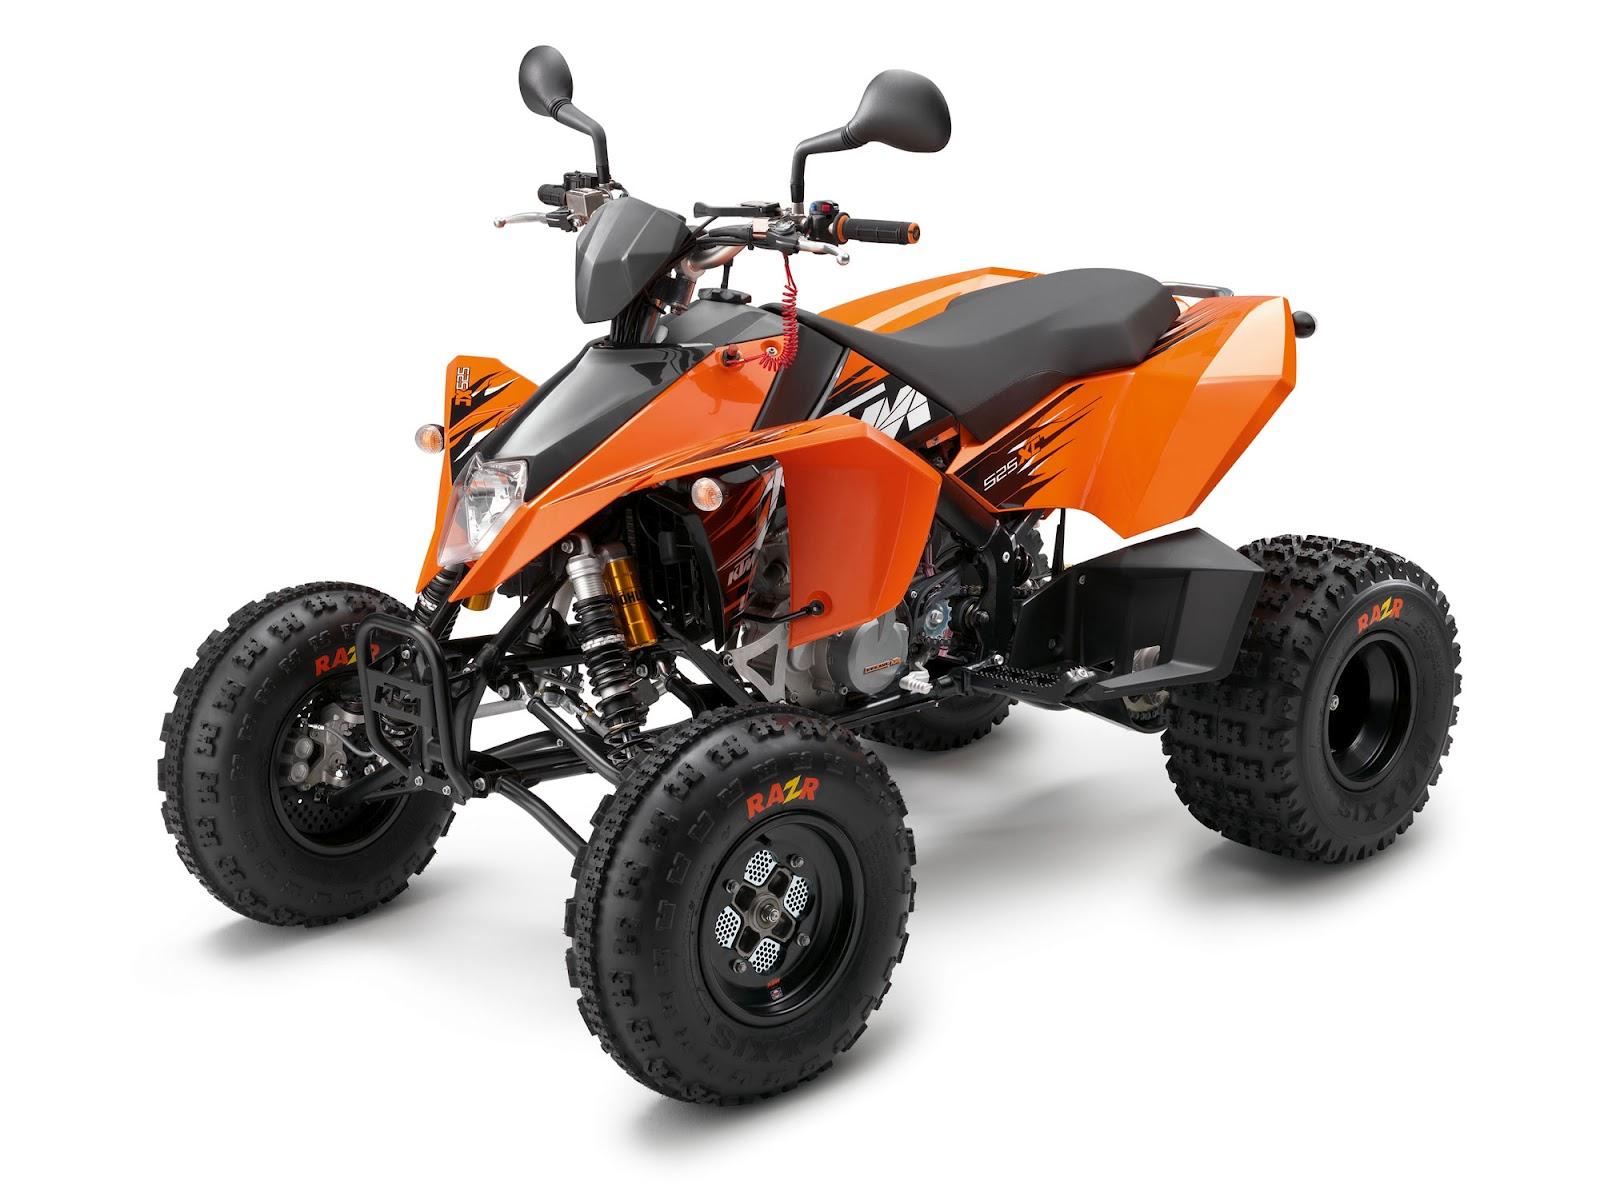 http://4.bp.blogspot.com/-g9dDSenhF44/T4CKYlbdZ8I/AAAAAAAABAU/a_ZVw-HeMRQ/s1600/KTM+525XC+ATV+2012+ATV+Pictures+02.jpg